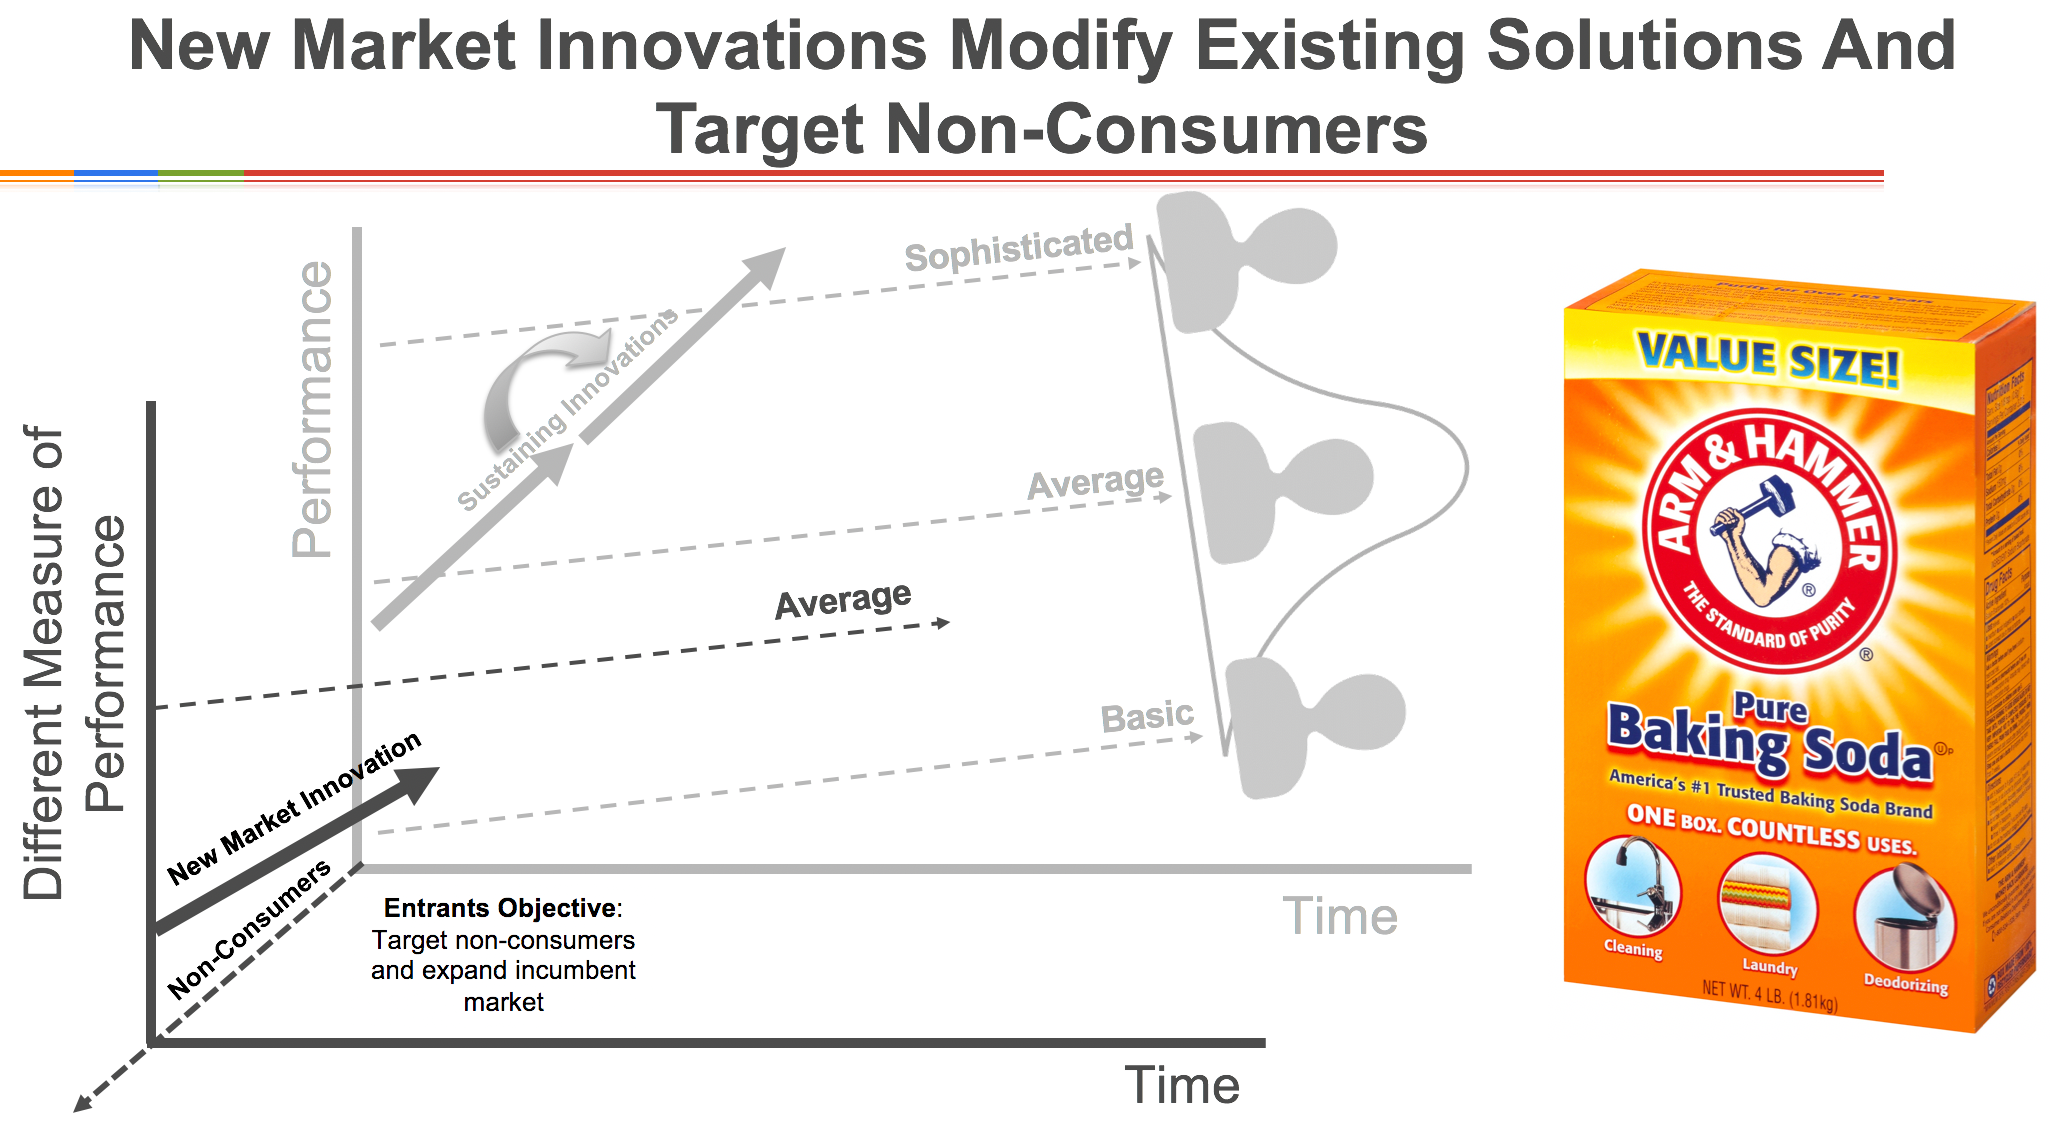 New Market Innovations Explained